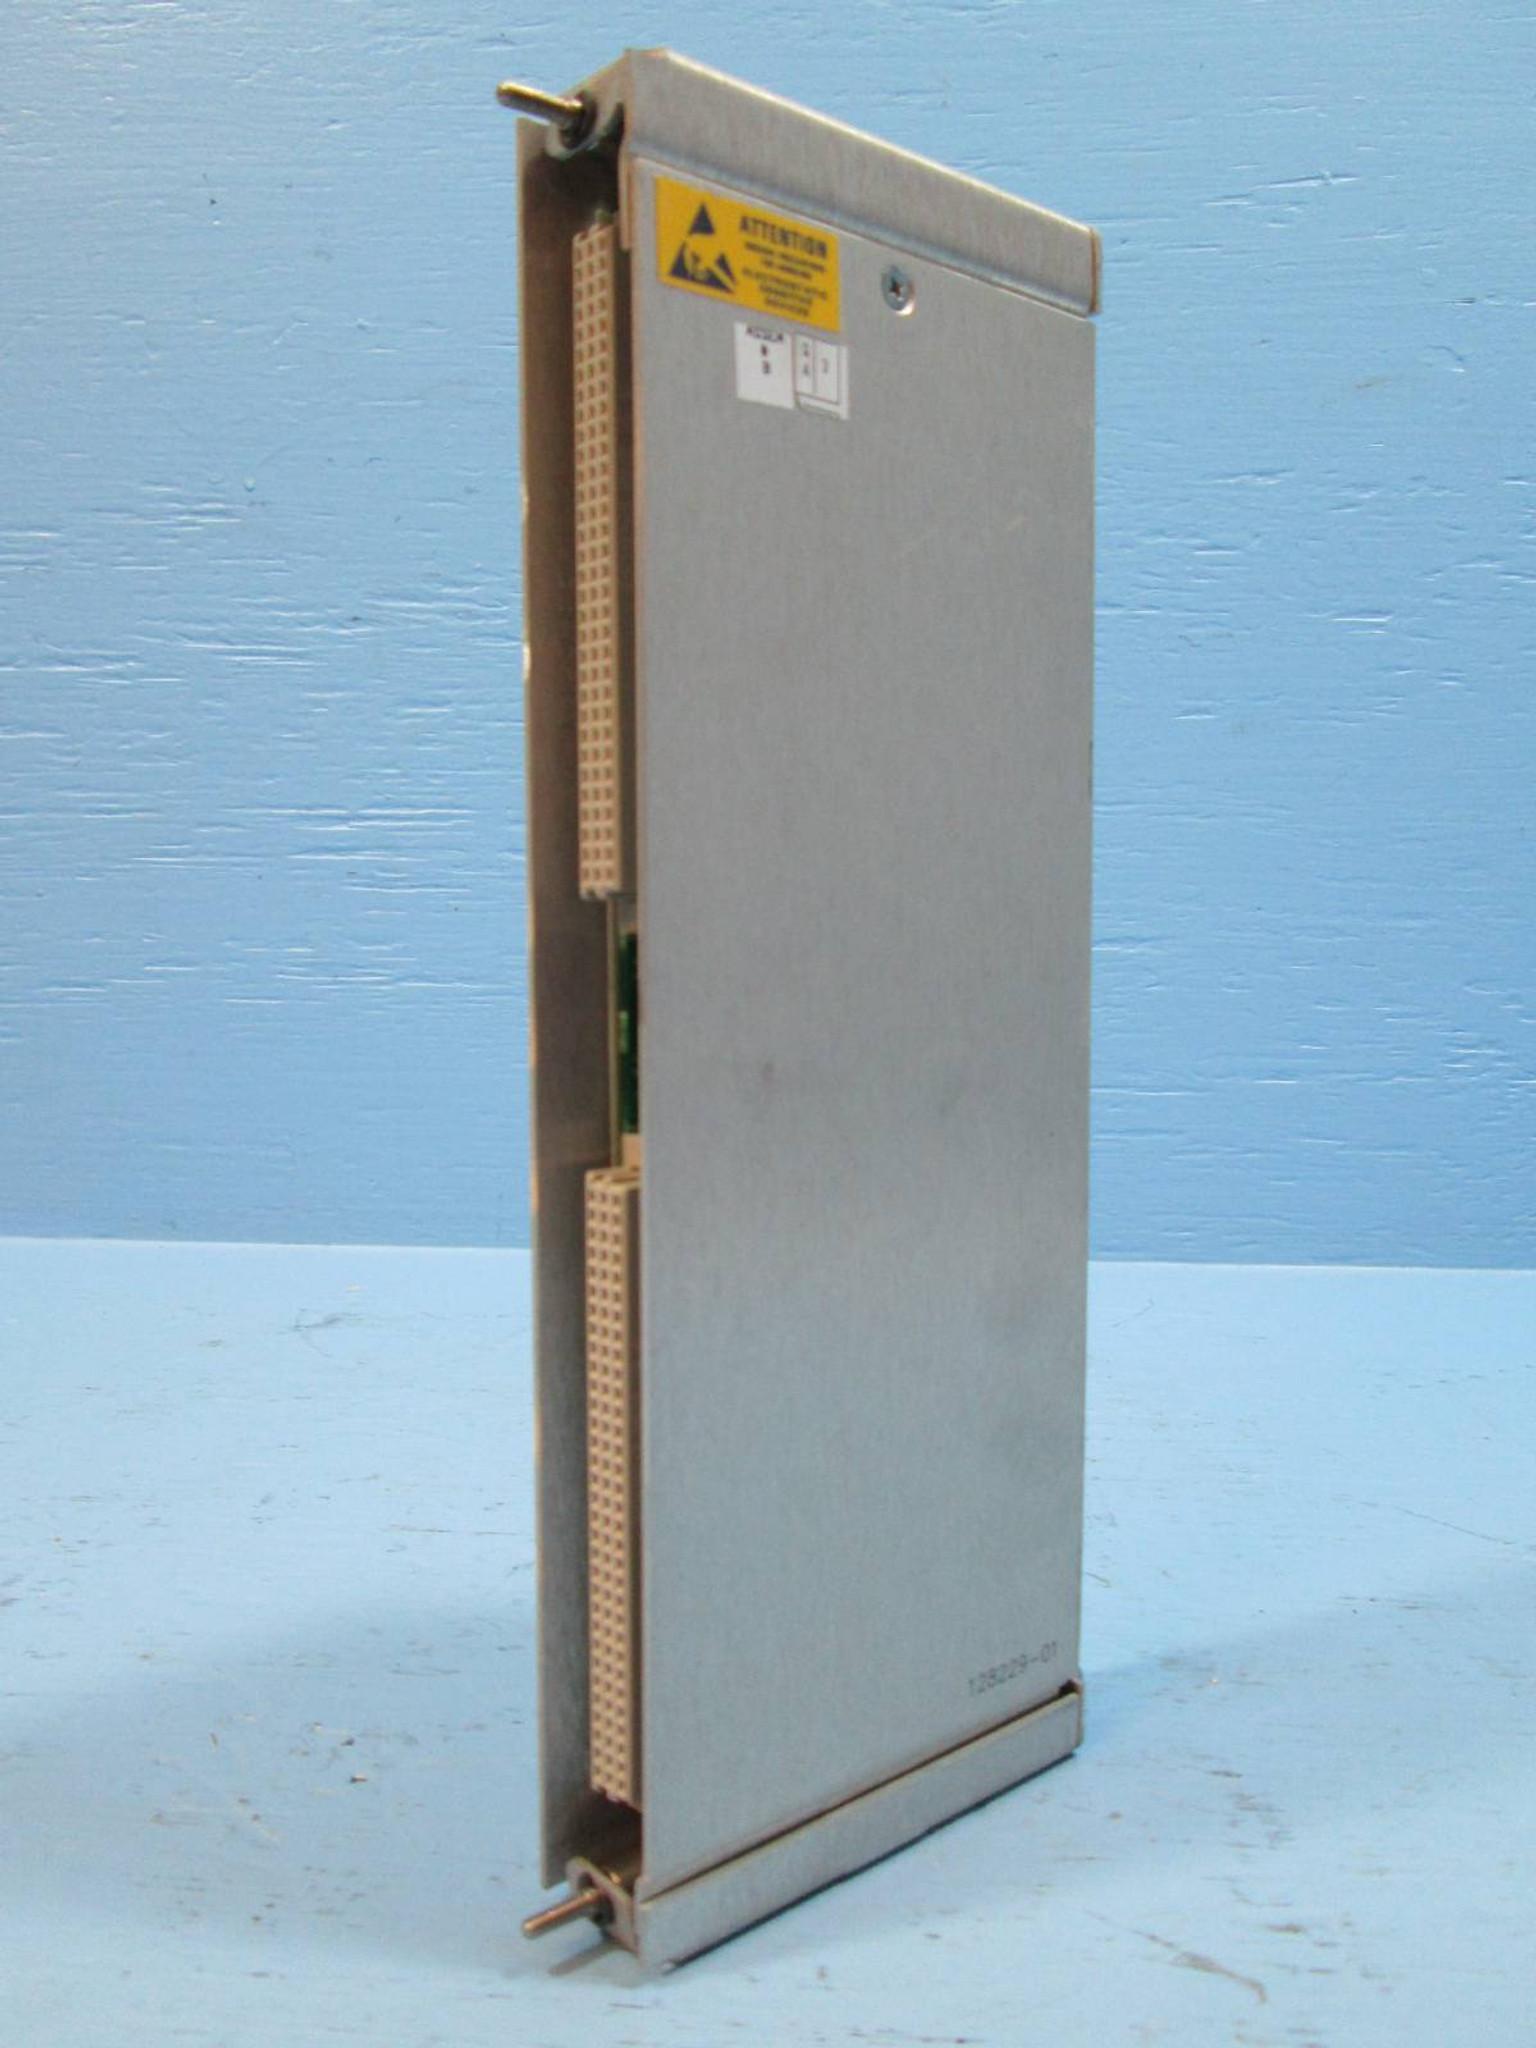 USED Bently Nevada 3500 Prox//Velom I//O Module 140471-01